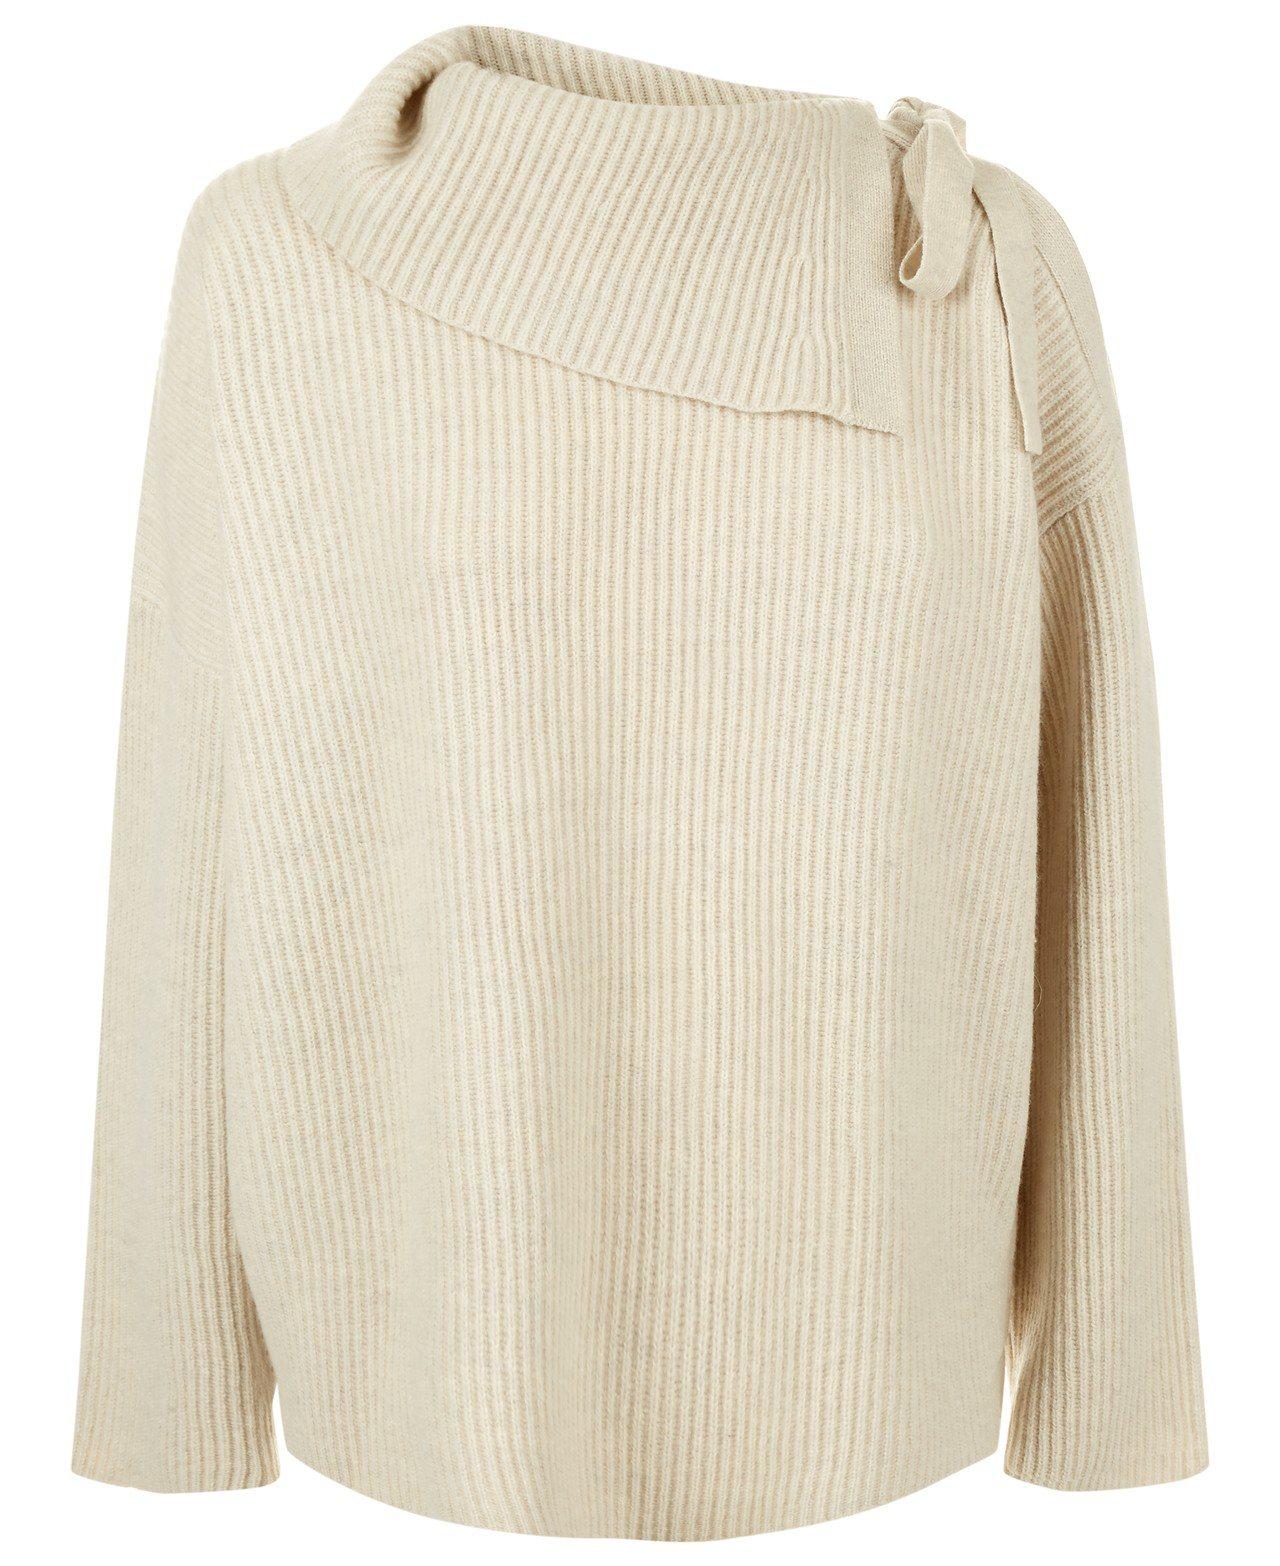 AllSaints Sura單肩蝴蝶結針織上衣,價格約8,700元。圖/AllS...